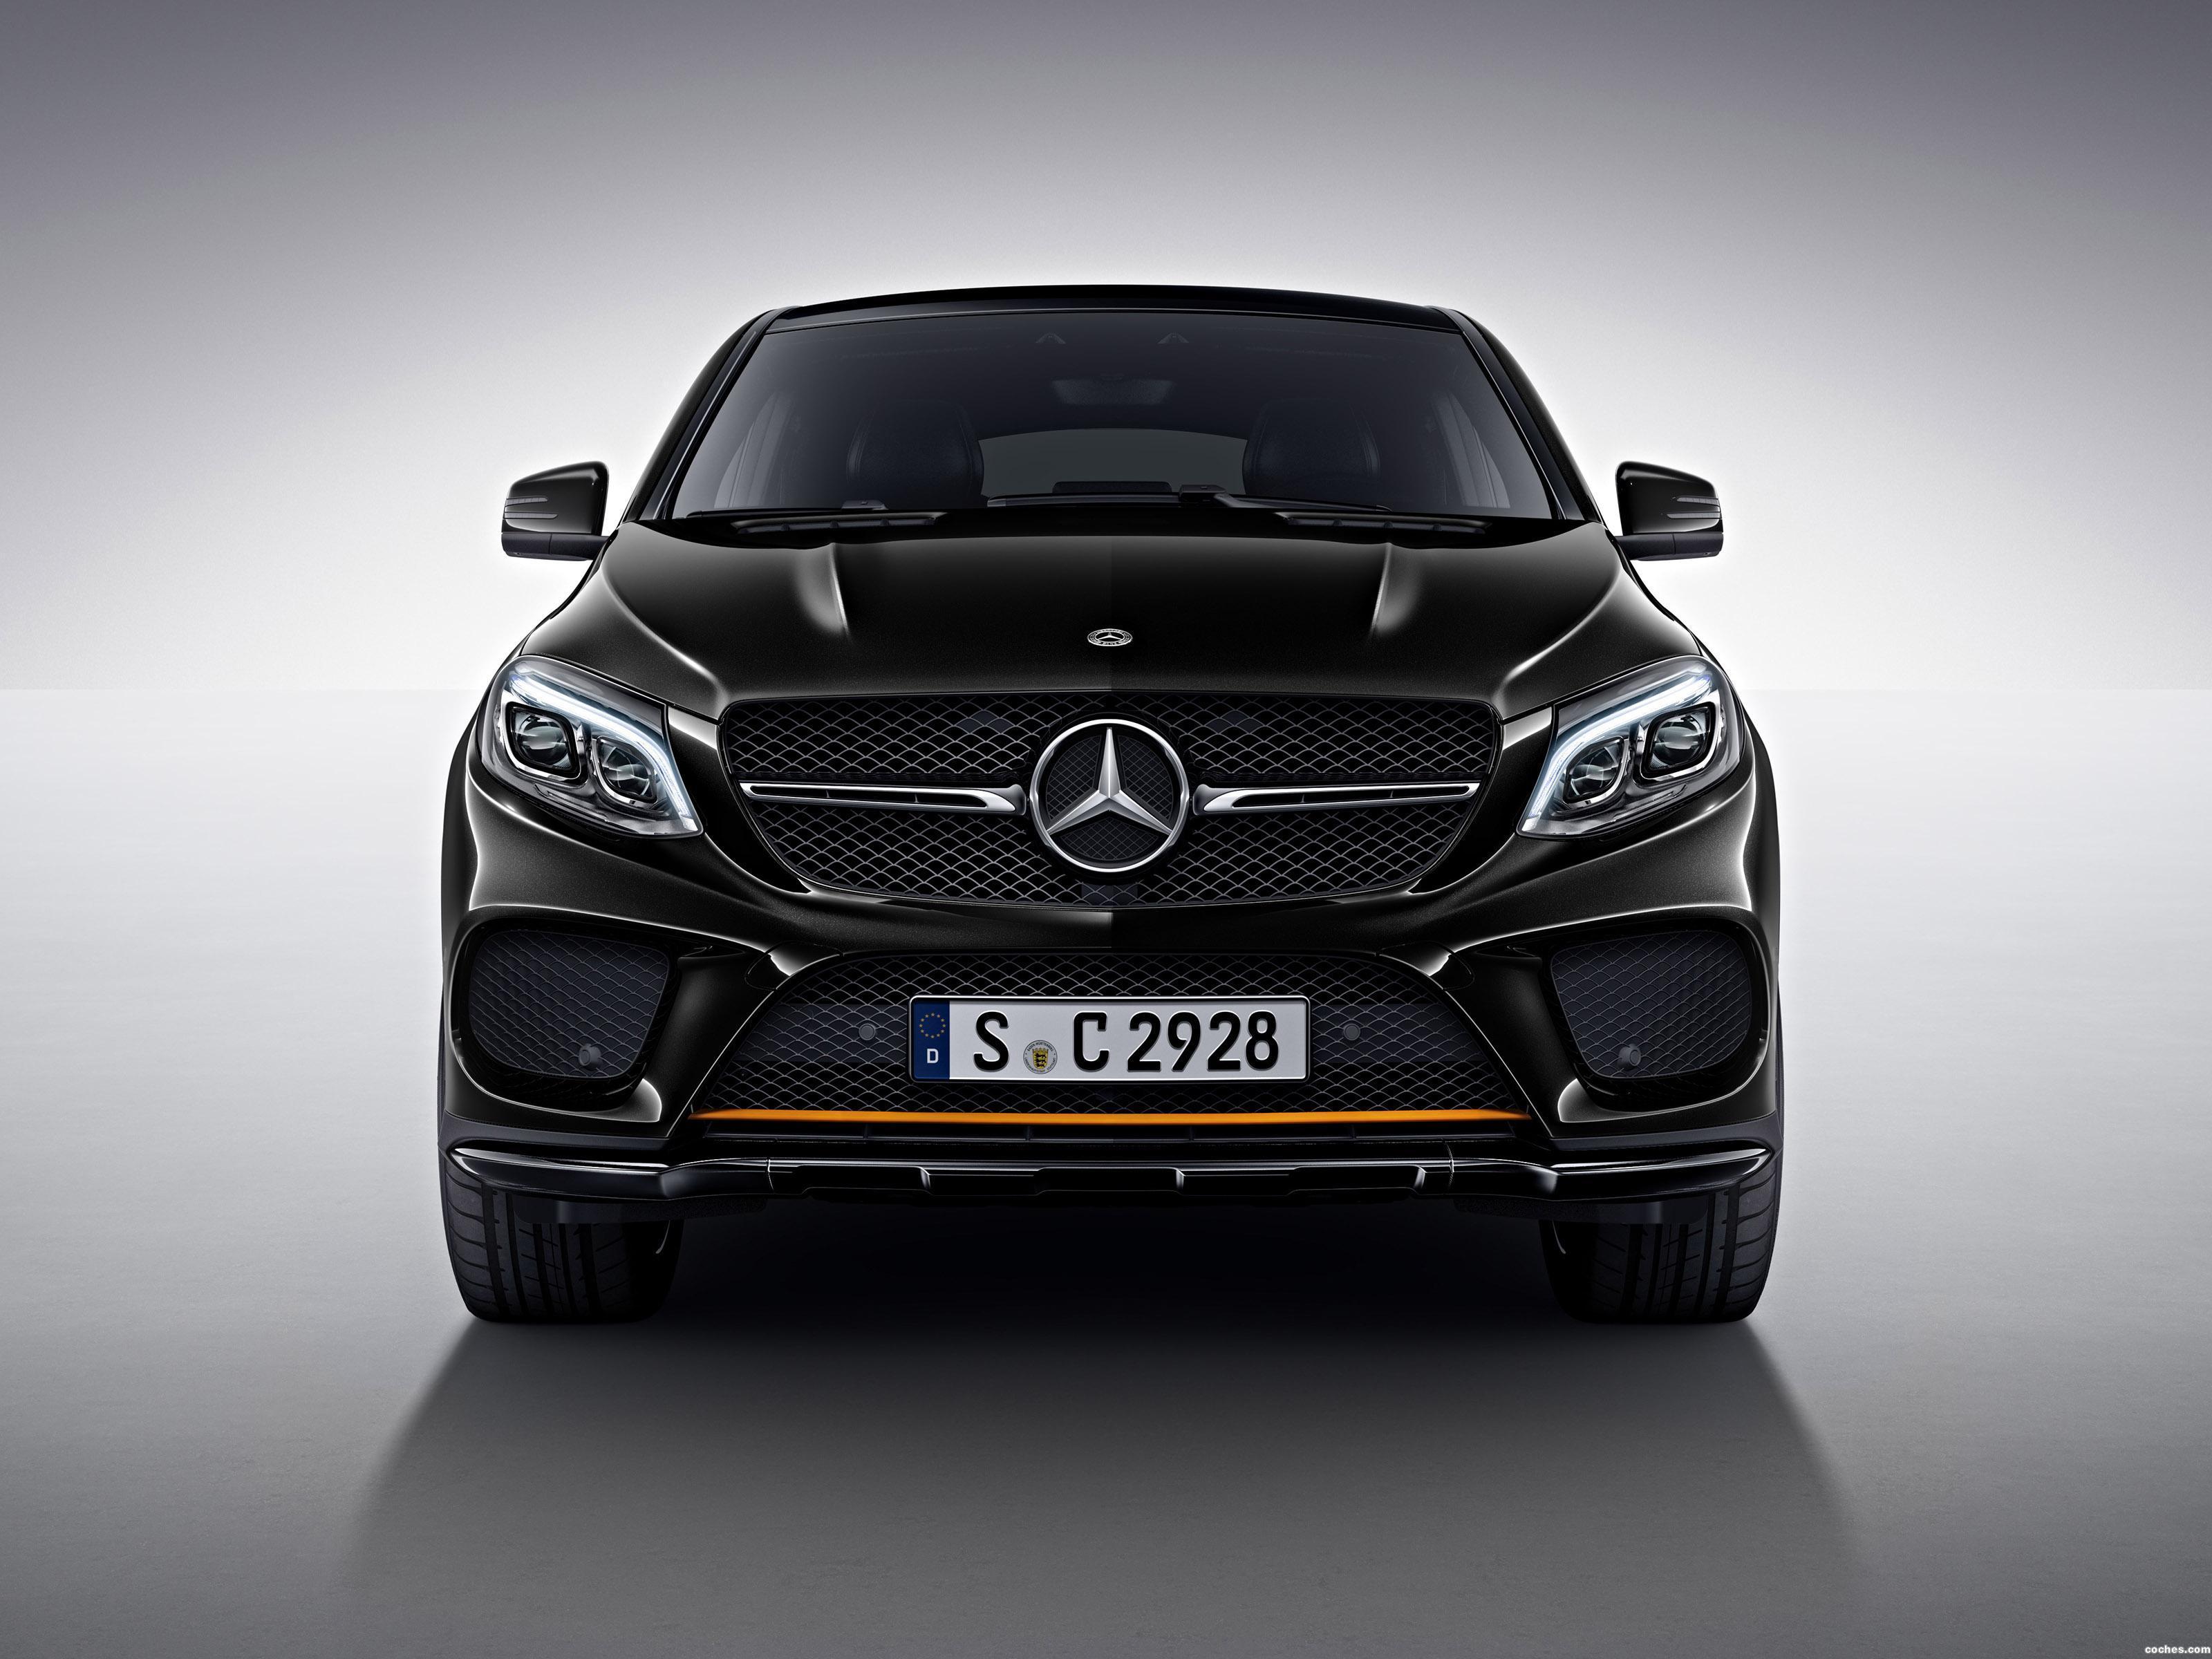 Foto 0 de Mercedes GLE Coupe Orangeart C292  2017